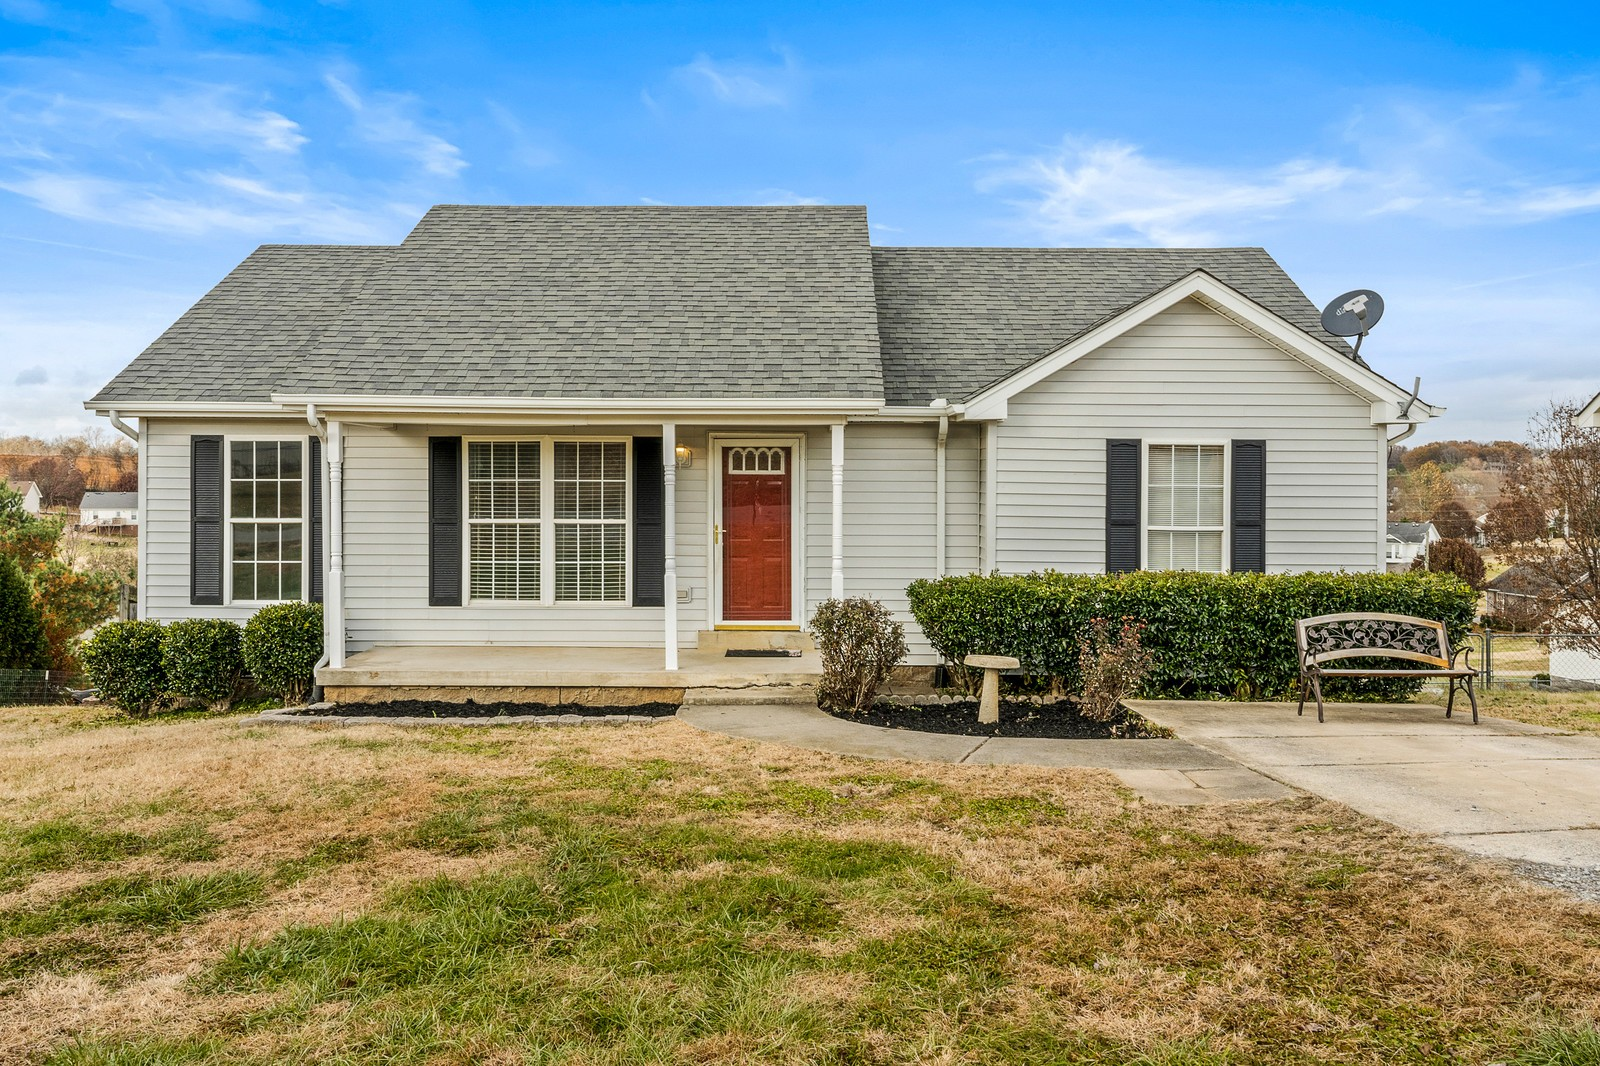 225 Elder Dr, Springfield, TN 37172 - Springfield, TN real estate listing